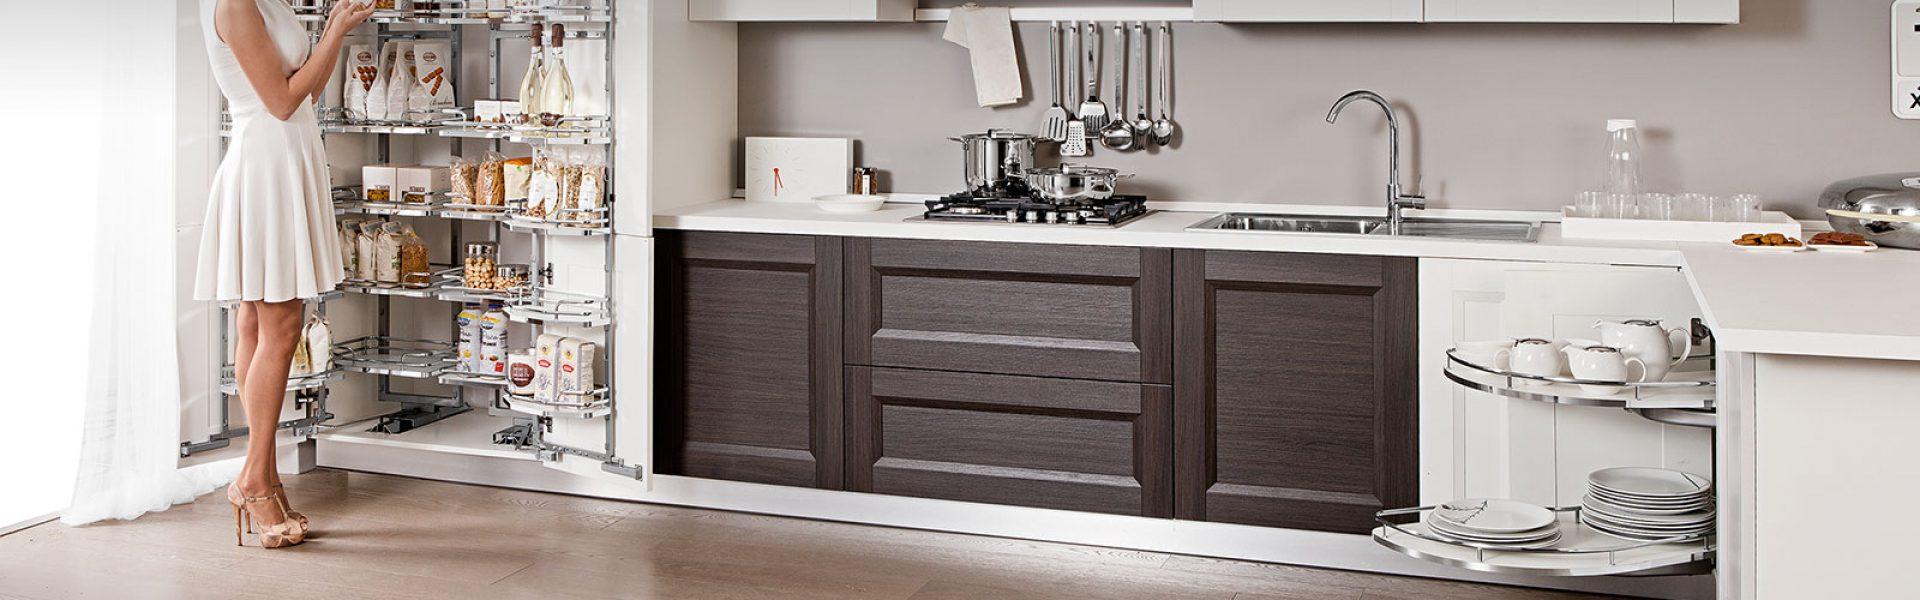 Vibo Wireware | Kitchen Accessories